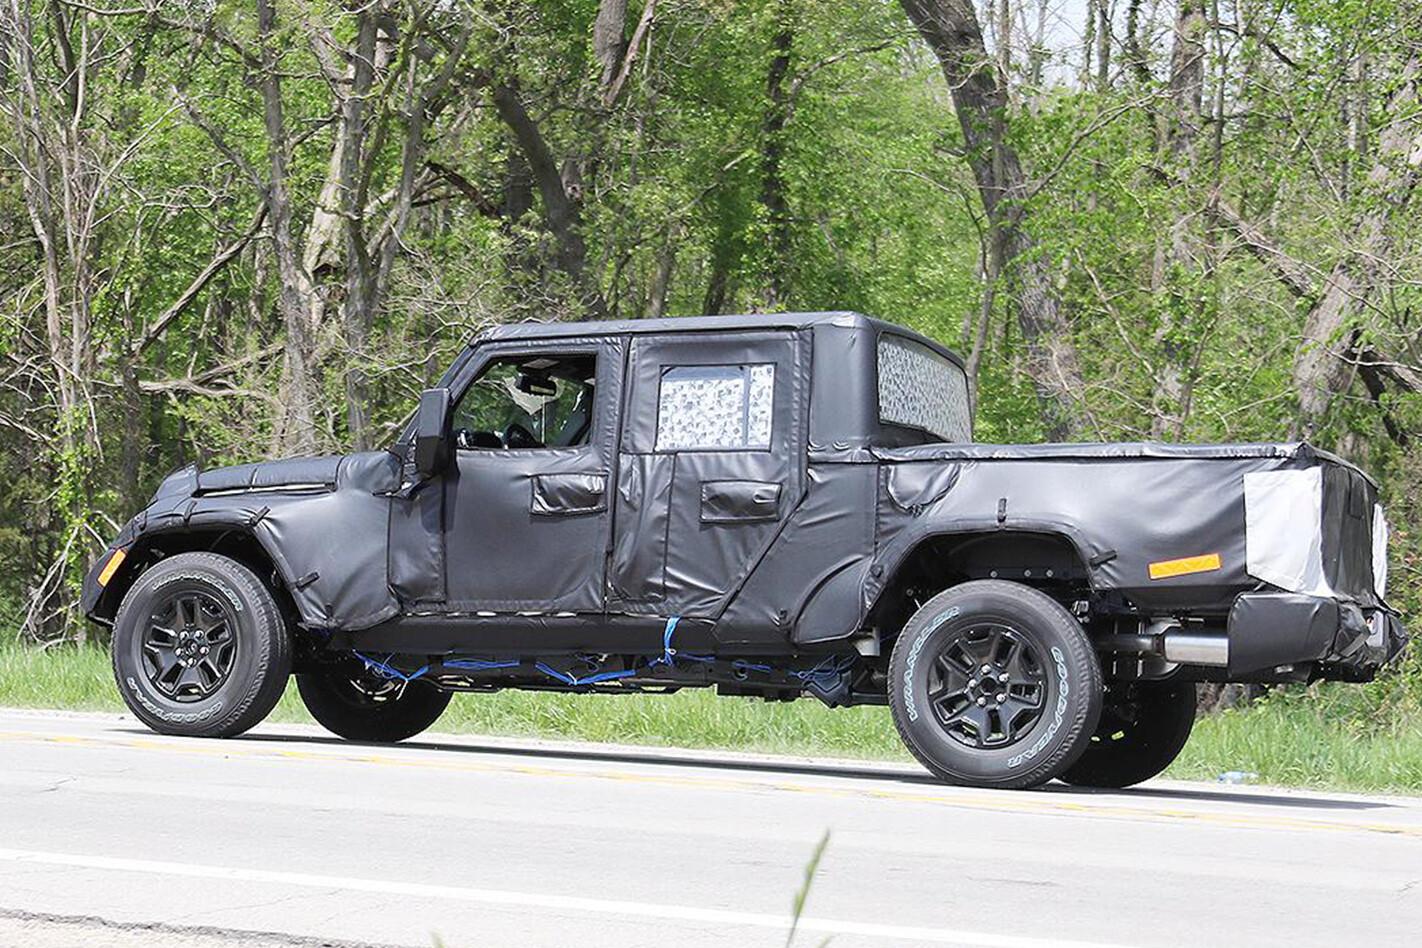 2018 Jeep Wrangler ute Spy pics rear